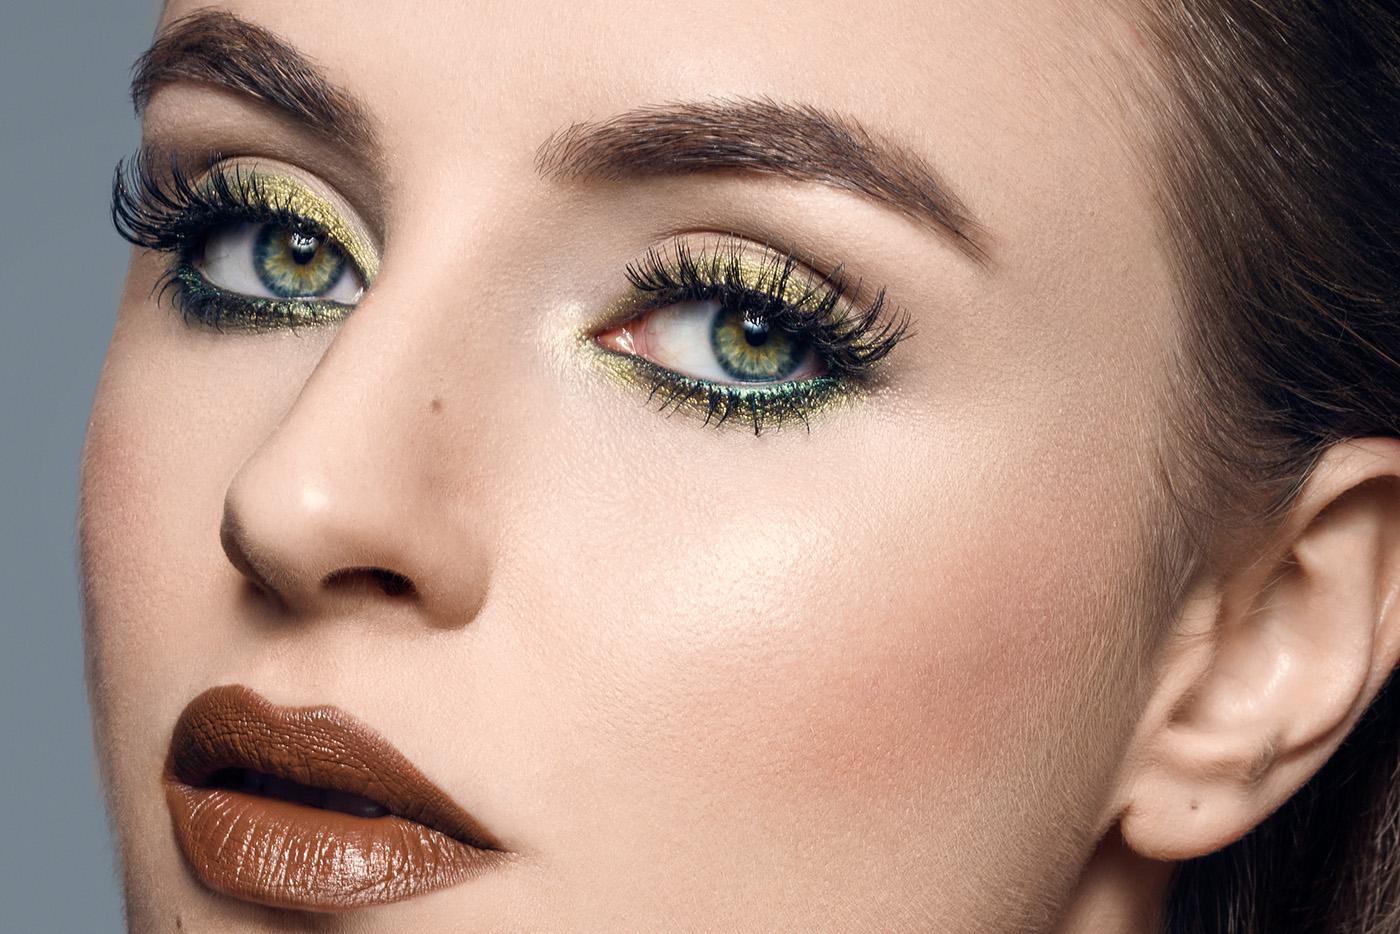 beauty high-end post-production makeup tratamento Imagem dodgeandburn dodge burn woman